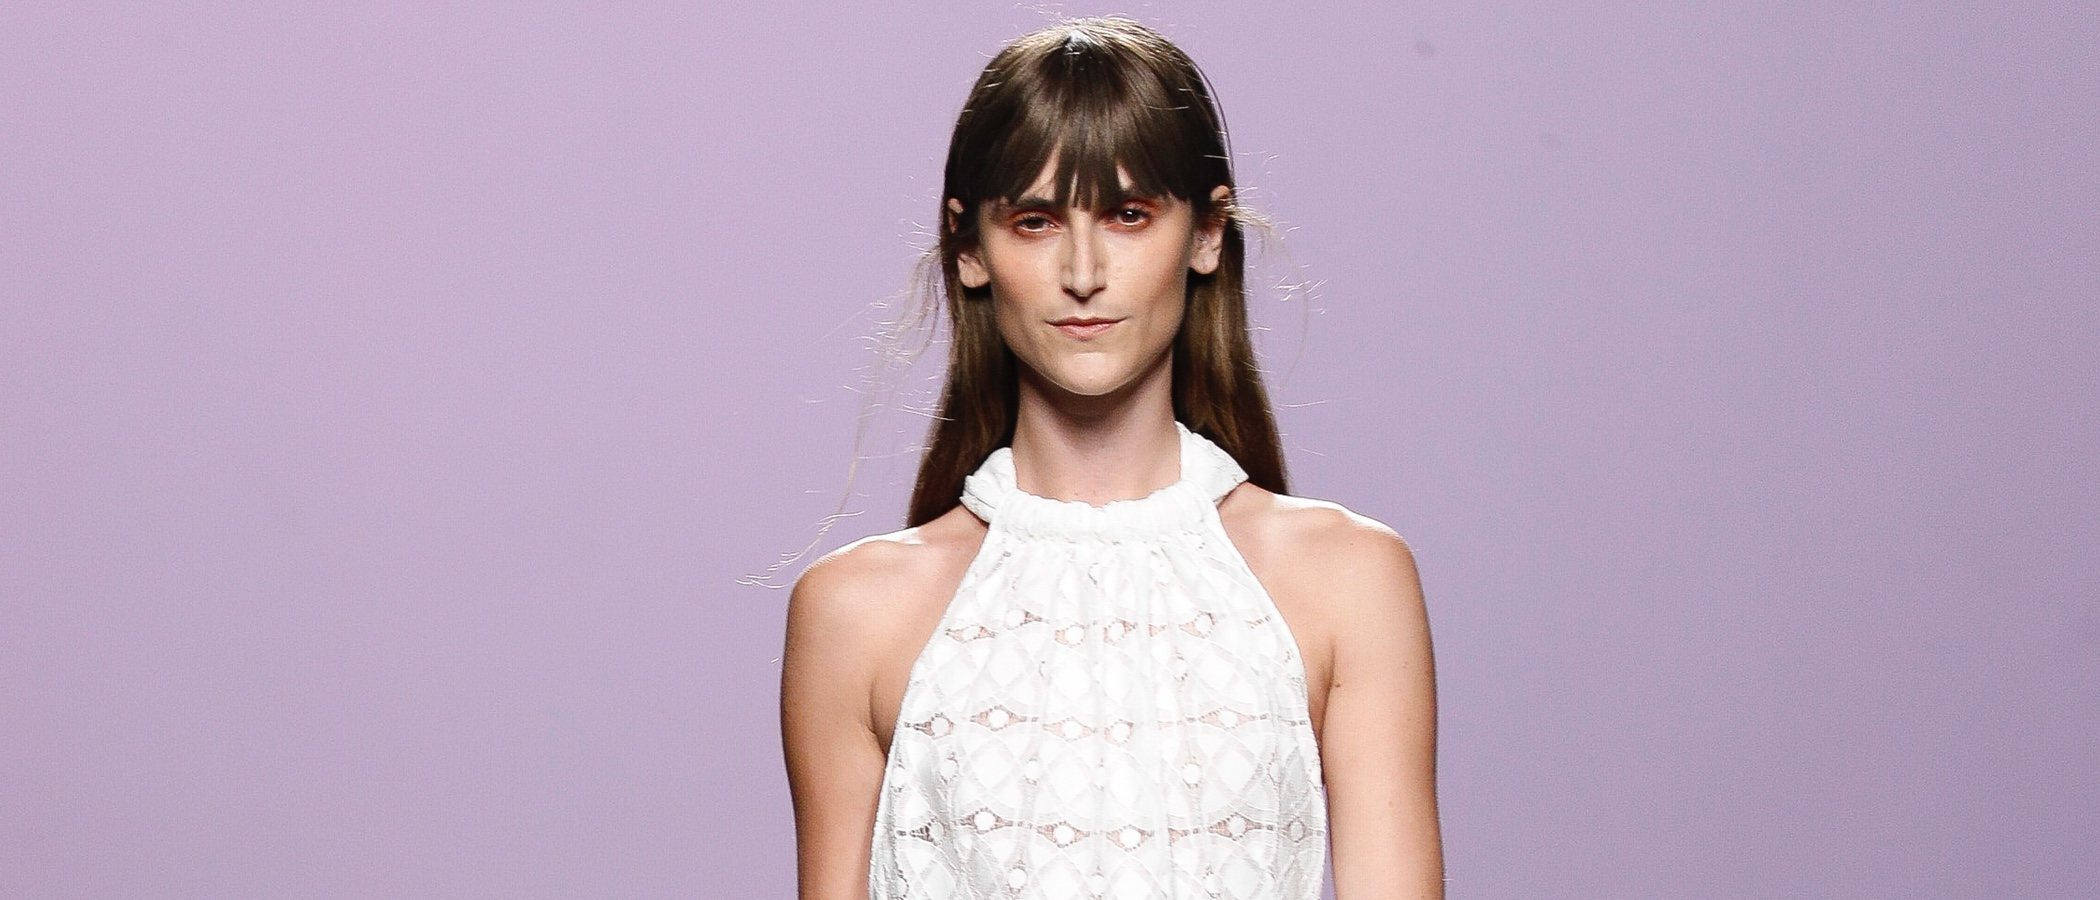 Roberto Torretta reinventa el estilo vintage en la Madrid Fashion Week primavera/verano 2019